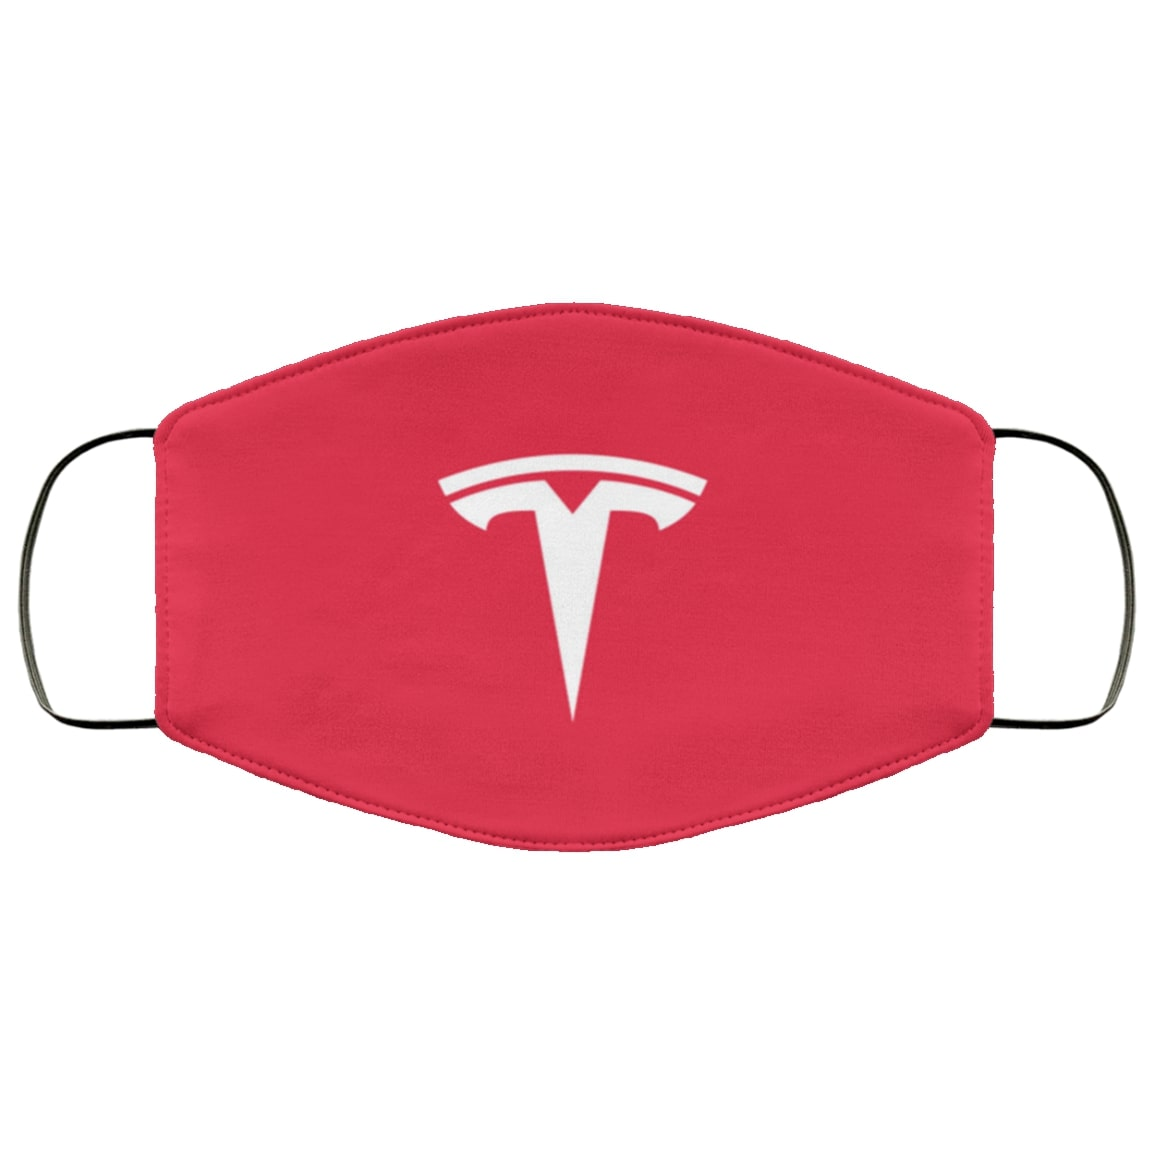 Tesla motors full over printed face mask 1